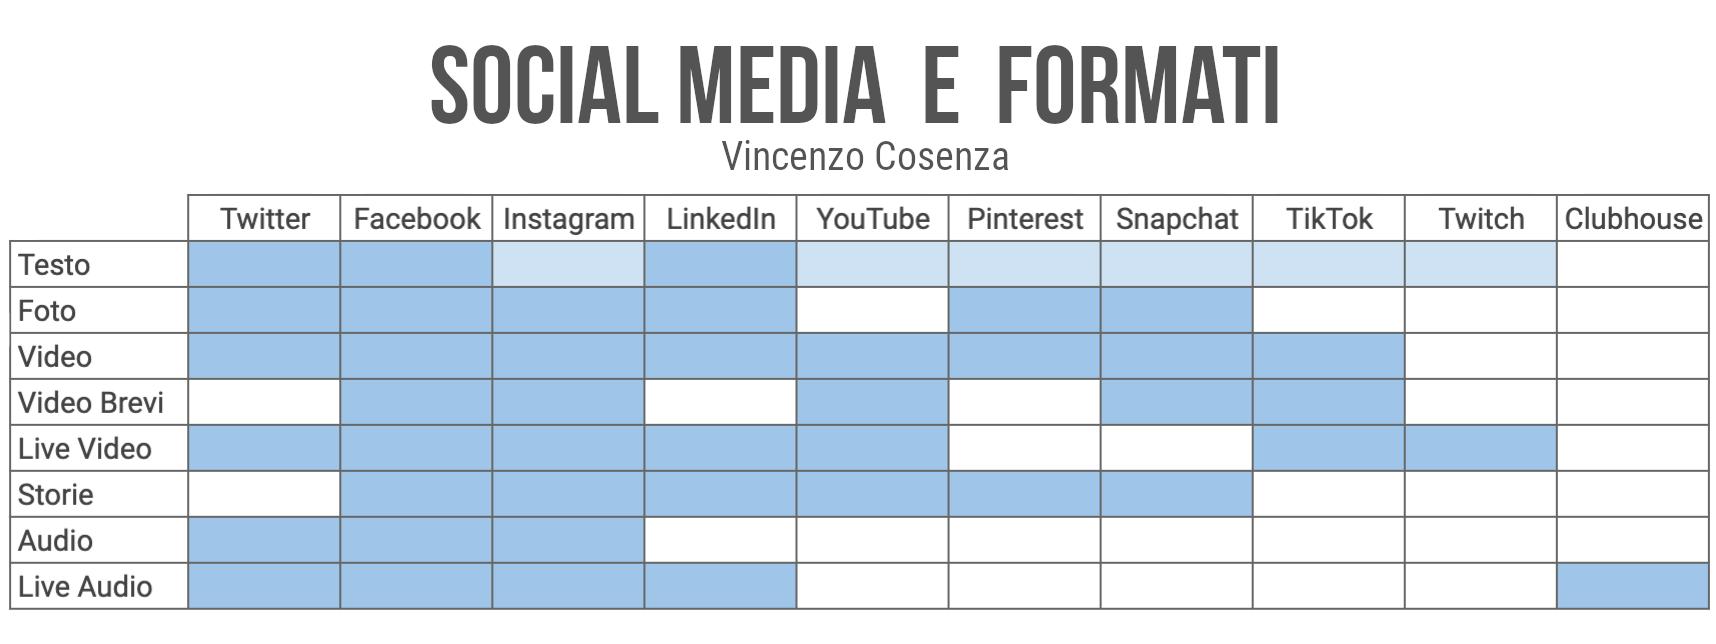 social media e formati 2021